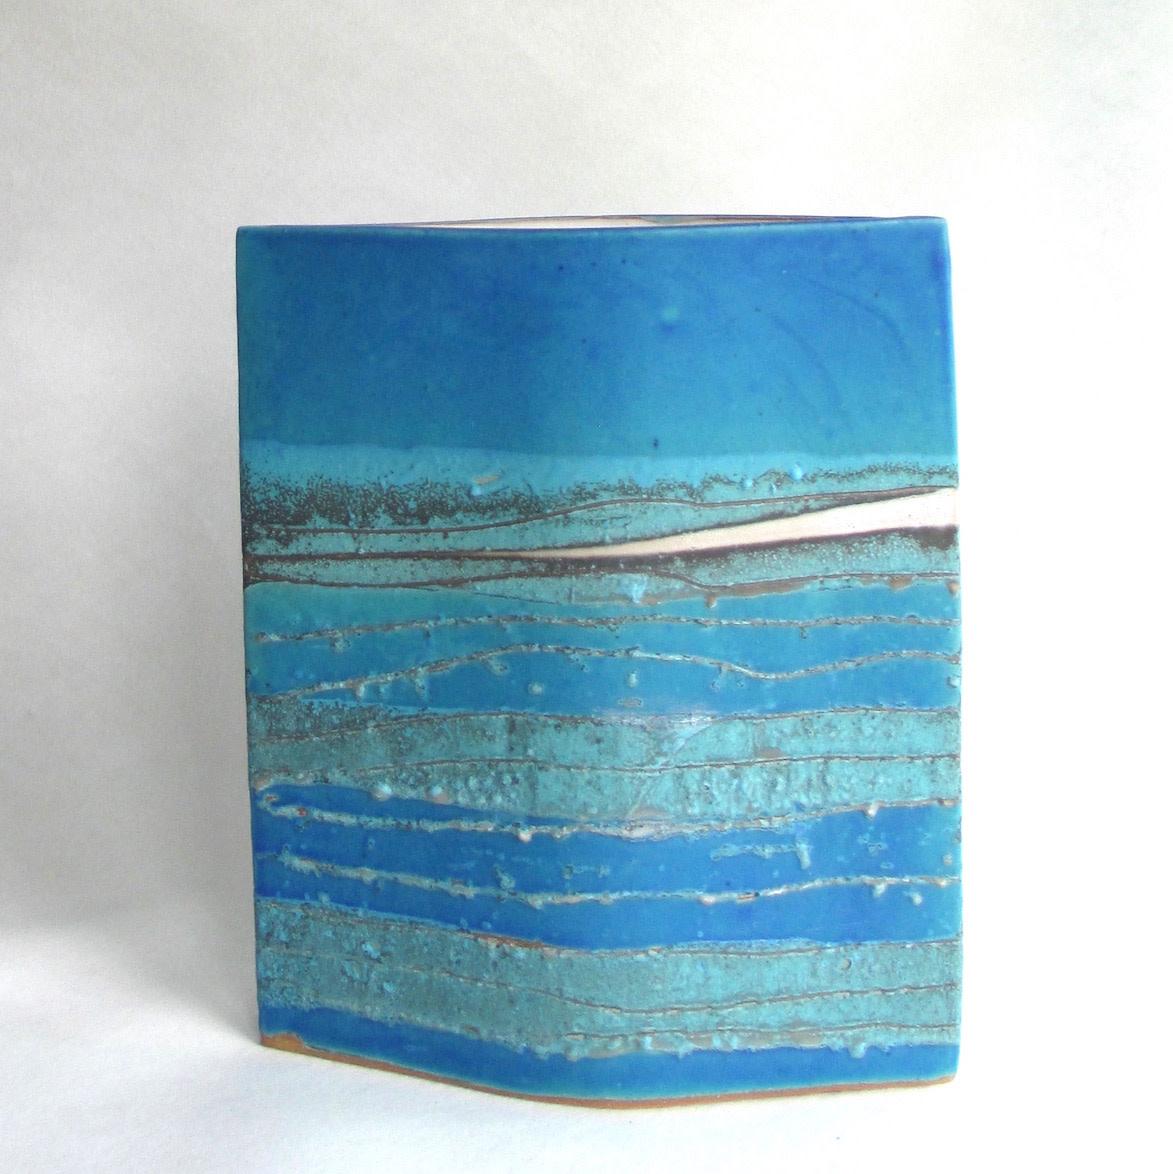 "<span class=""link fancybox-details-link""><a href=""/artists/44-sarah-perry/works/6469-sarah-perry-blue-water-ellipse-2019/"">View Detail Page</a></span><div class=""artist""><strong>Sarah Perry</strong></div> <div class=""title""><em>Blue Water Ellipse</em>, 2019</div> <div class=""medium"">stoneware</div> <div class=""dimensions"">h. 29 cm x w. 24 cm</div><div class=""copyright_line"">Ownart: £33 x 10 Months, 0% APR</div>"